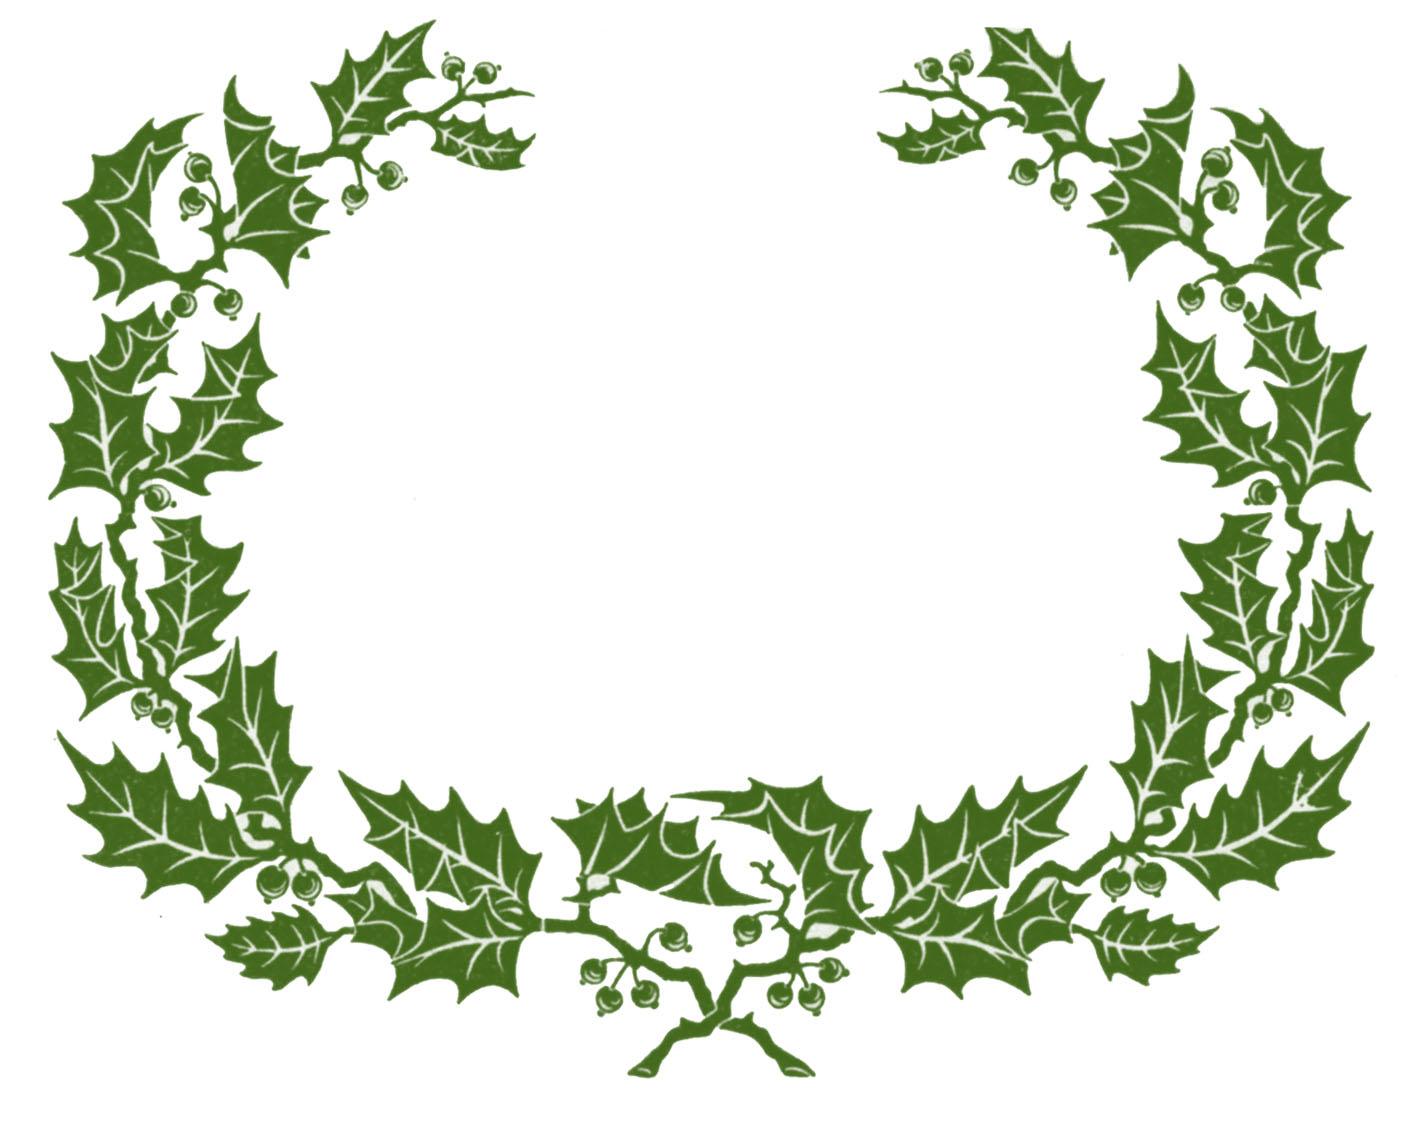 Christmas Holly Clip Art.Christmas Holly Border Clip Art N2 Free Image